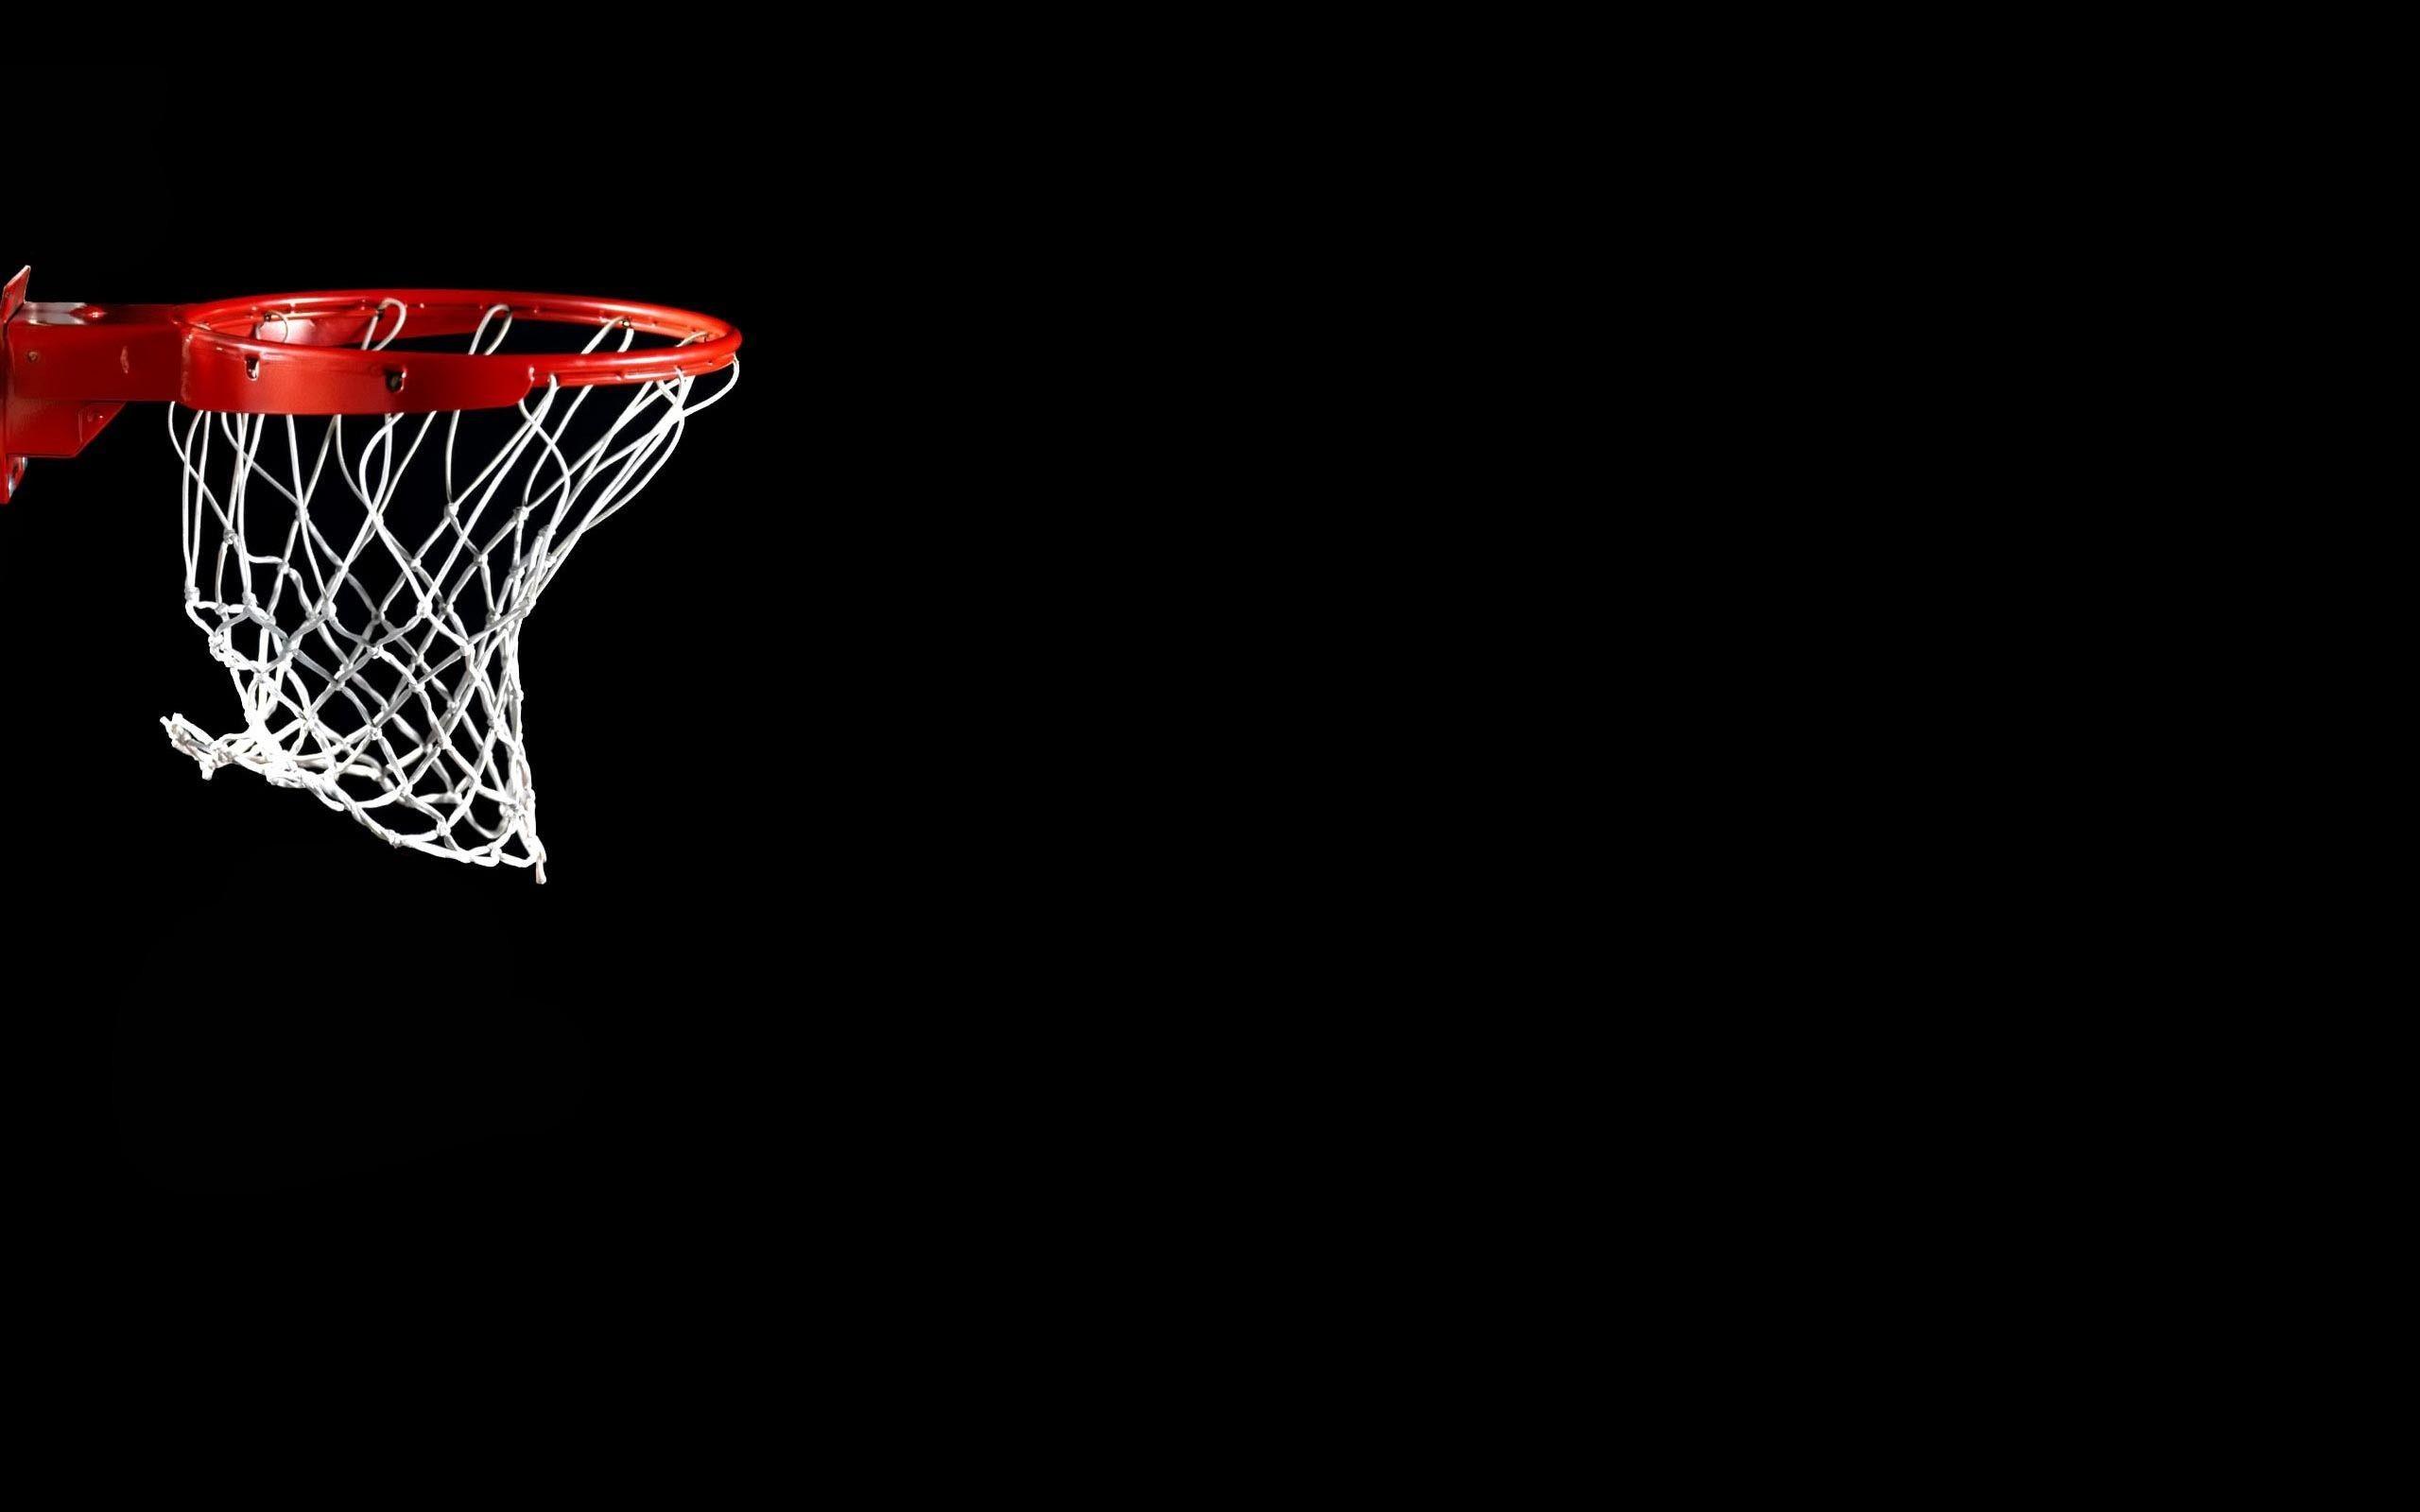 Great Wallpaper High Quality Basketball - 614134  Trends_326856.jpg